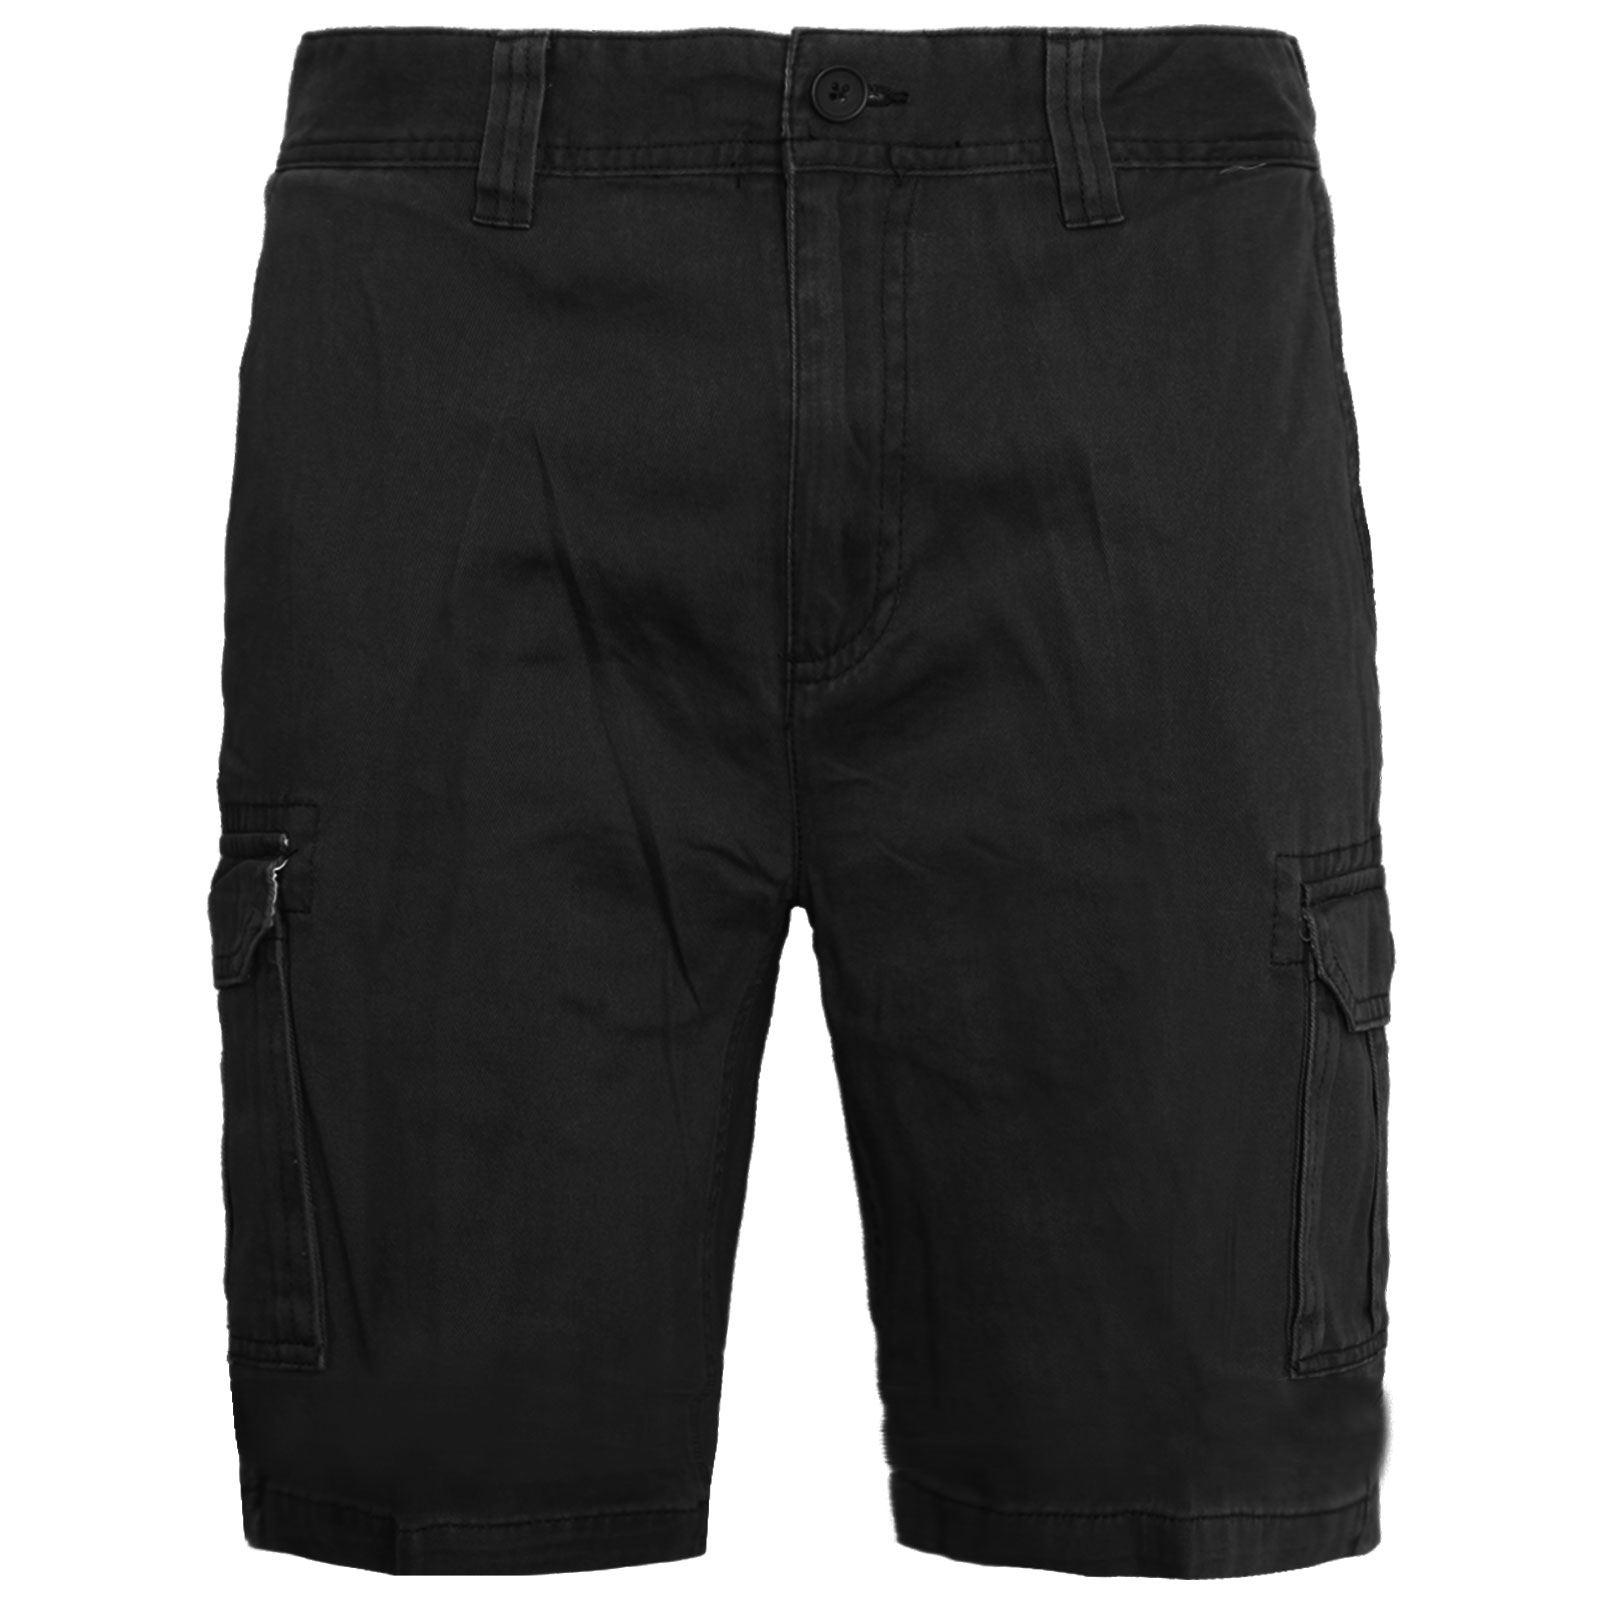 Mens-Multi-Pocket-Cargo-Shorts-Combat-Chino-Half-Pants-100-Cotton-Work-30-46 thumbnail 4